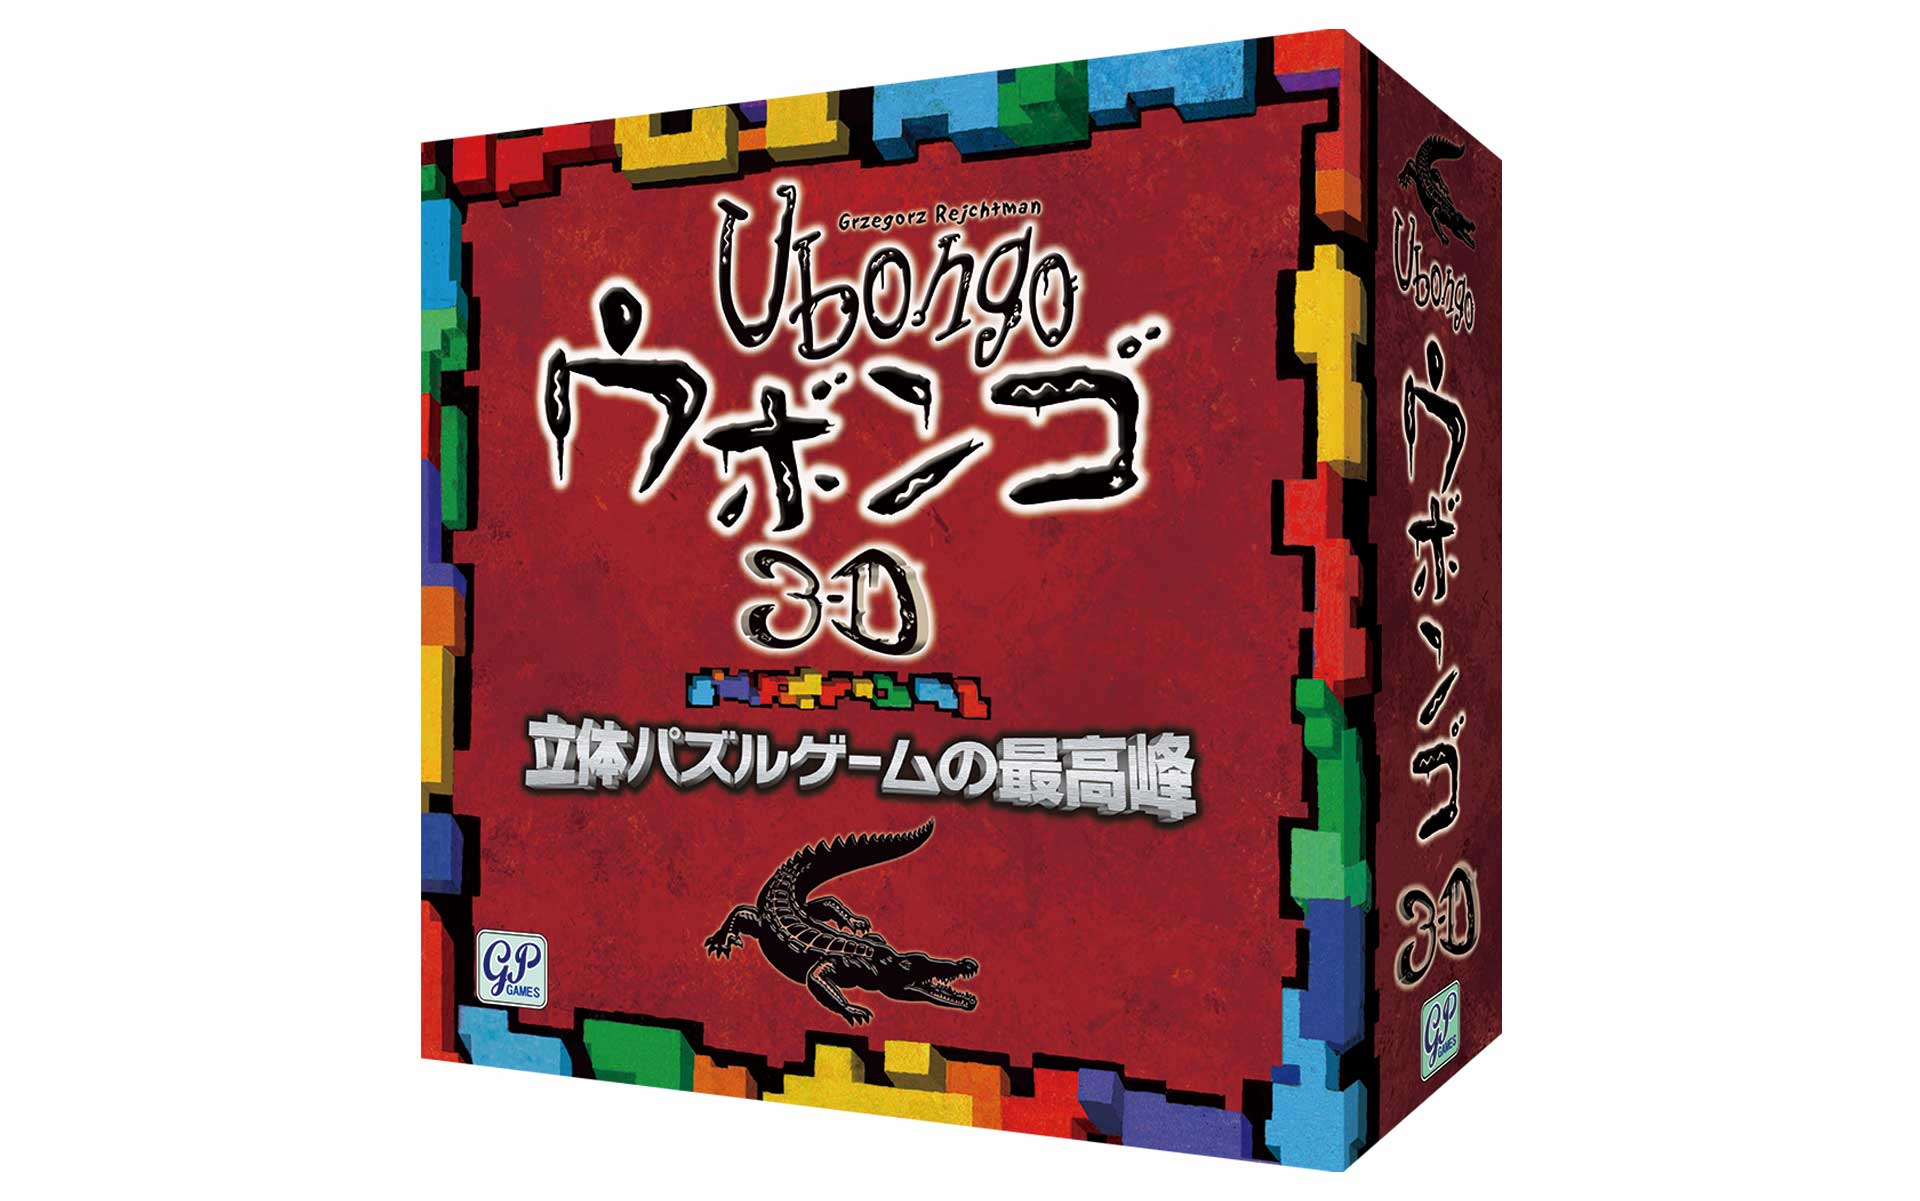 http://www.gp-inc.jp/assets/images/boardgame/ubongo3d_01.jpg